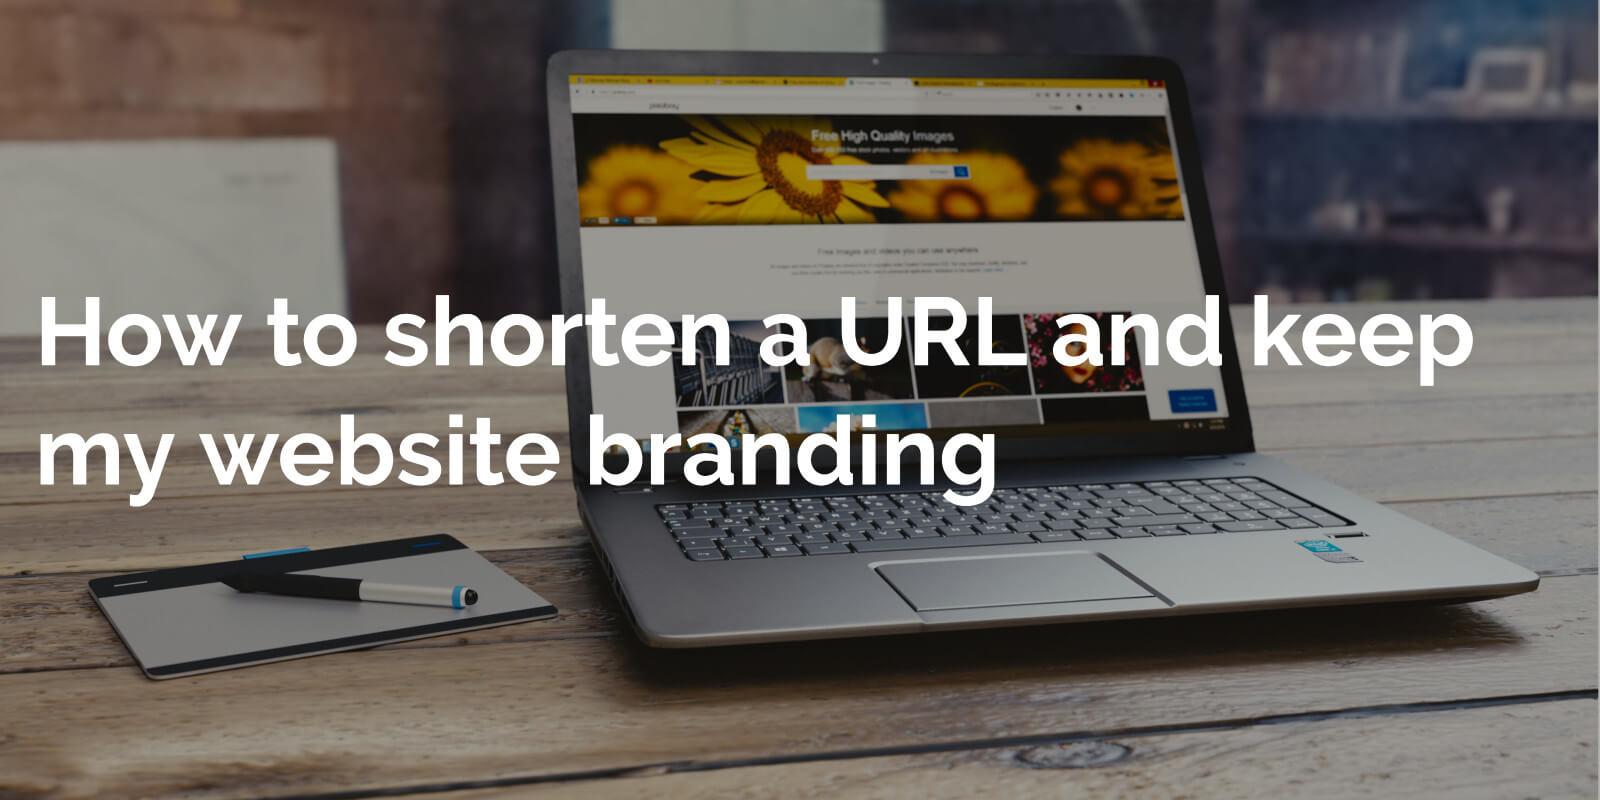 How to shorten a URL and keep my website branding